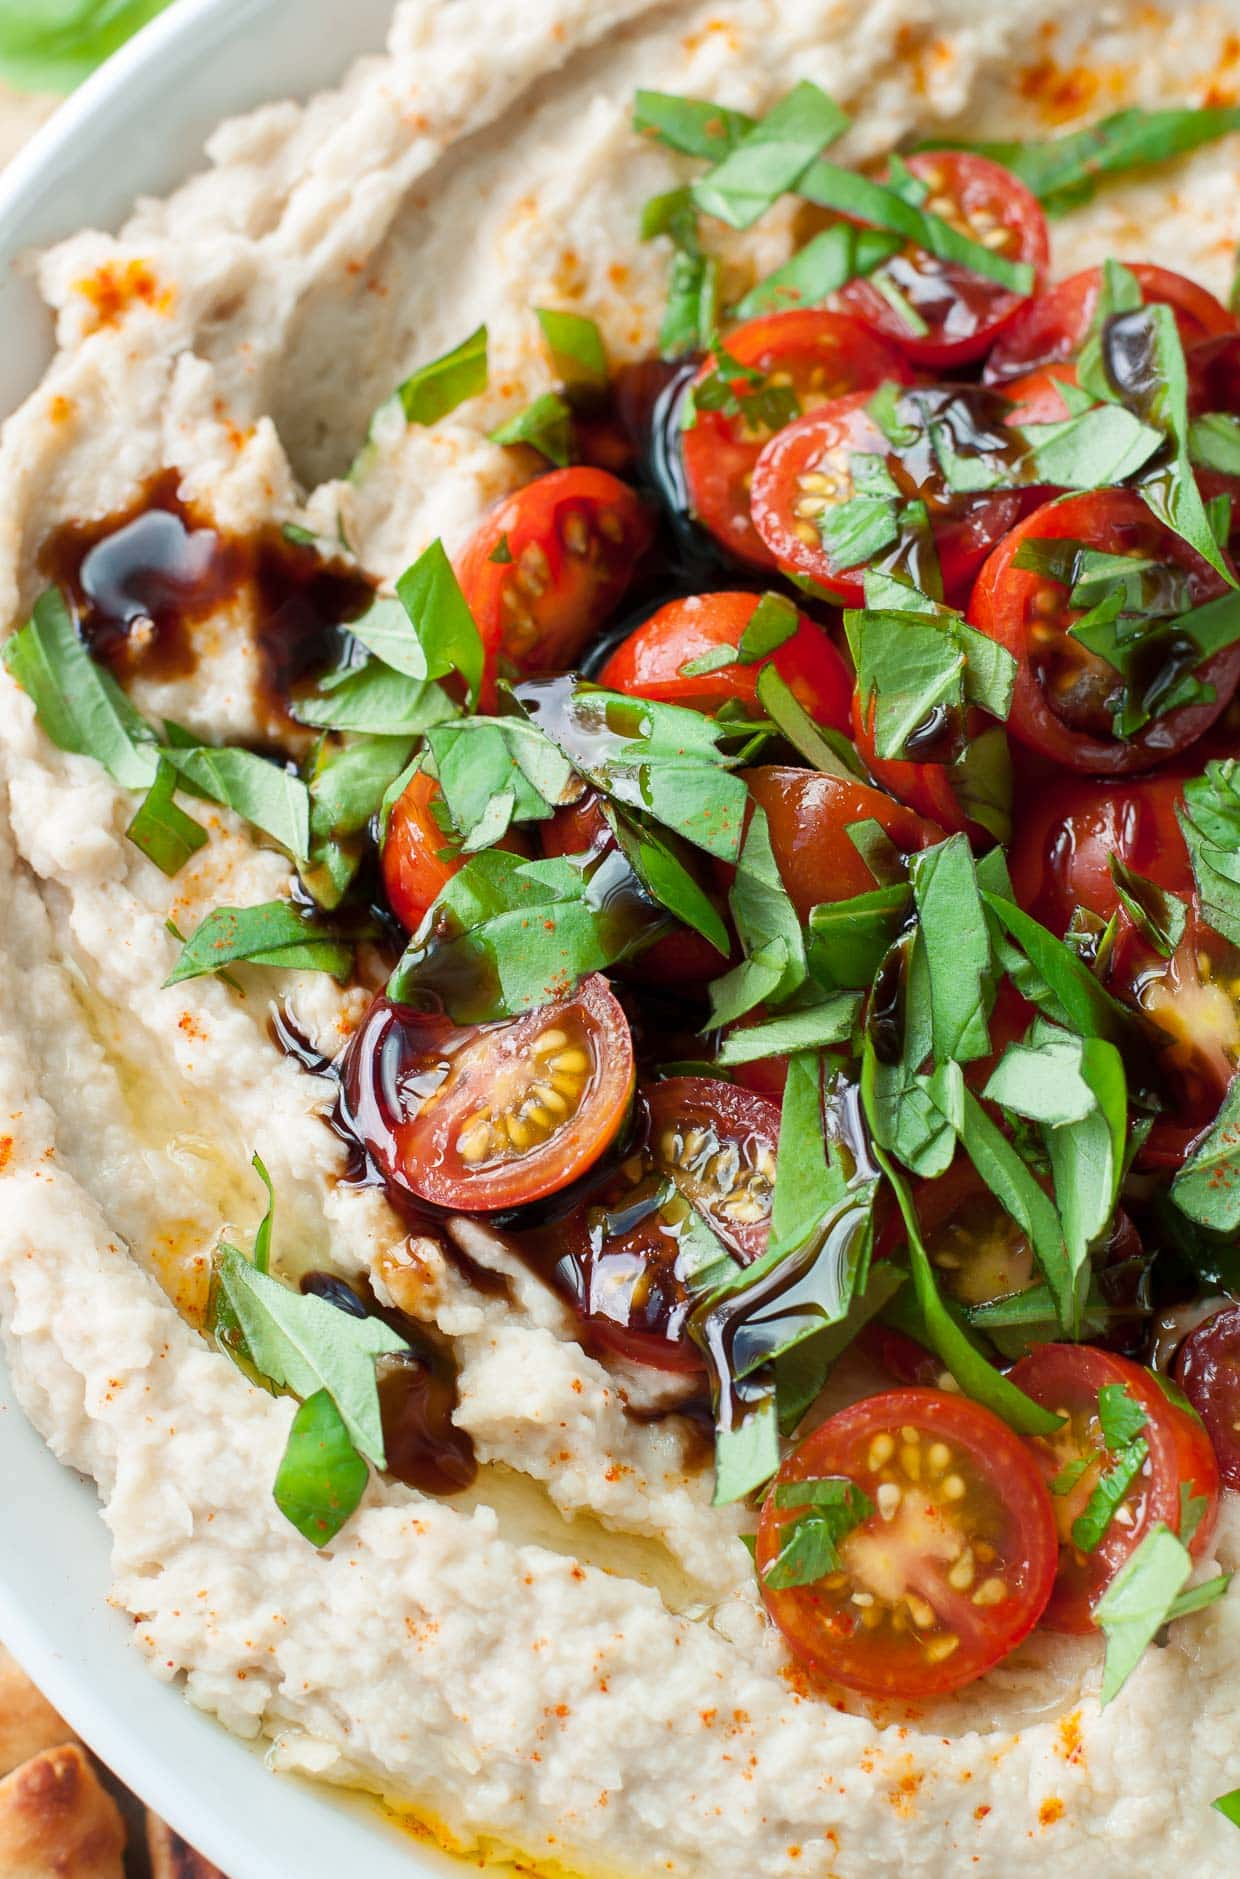 Creative Recipes Using Basil-Tomato basil White bean dip